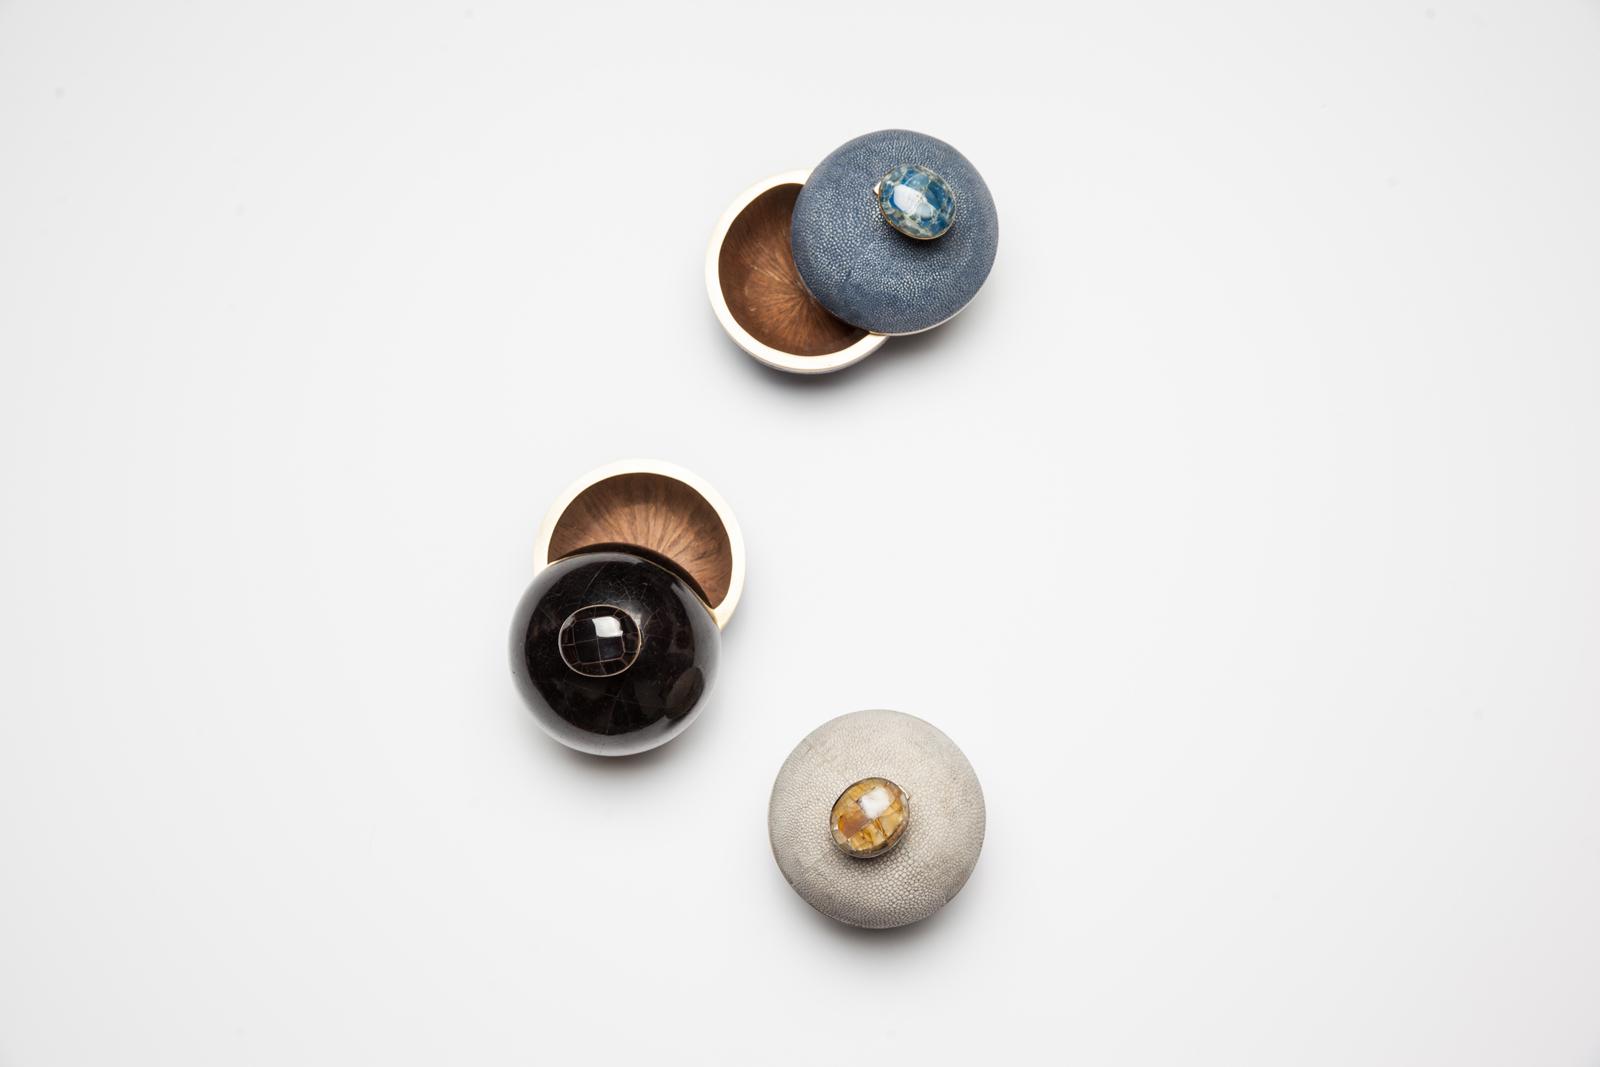 kifu-paris-cannister-shagreen-brass-black-penshell-shell